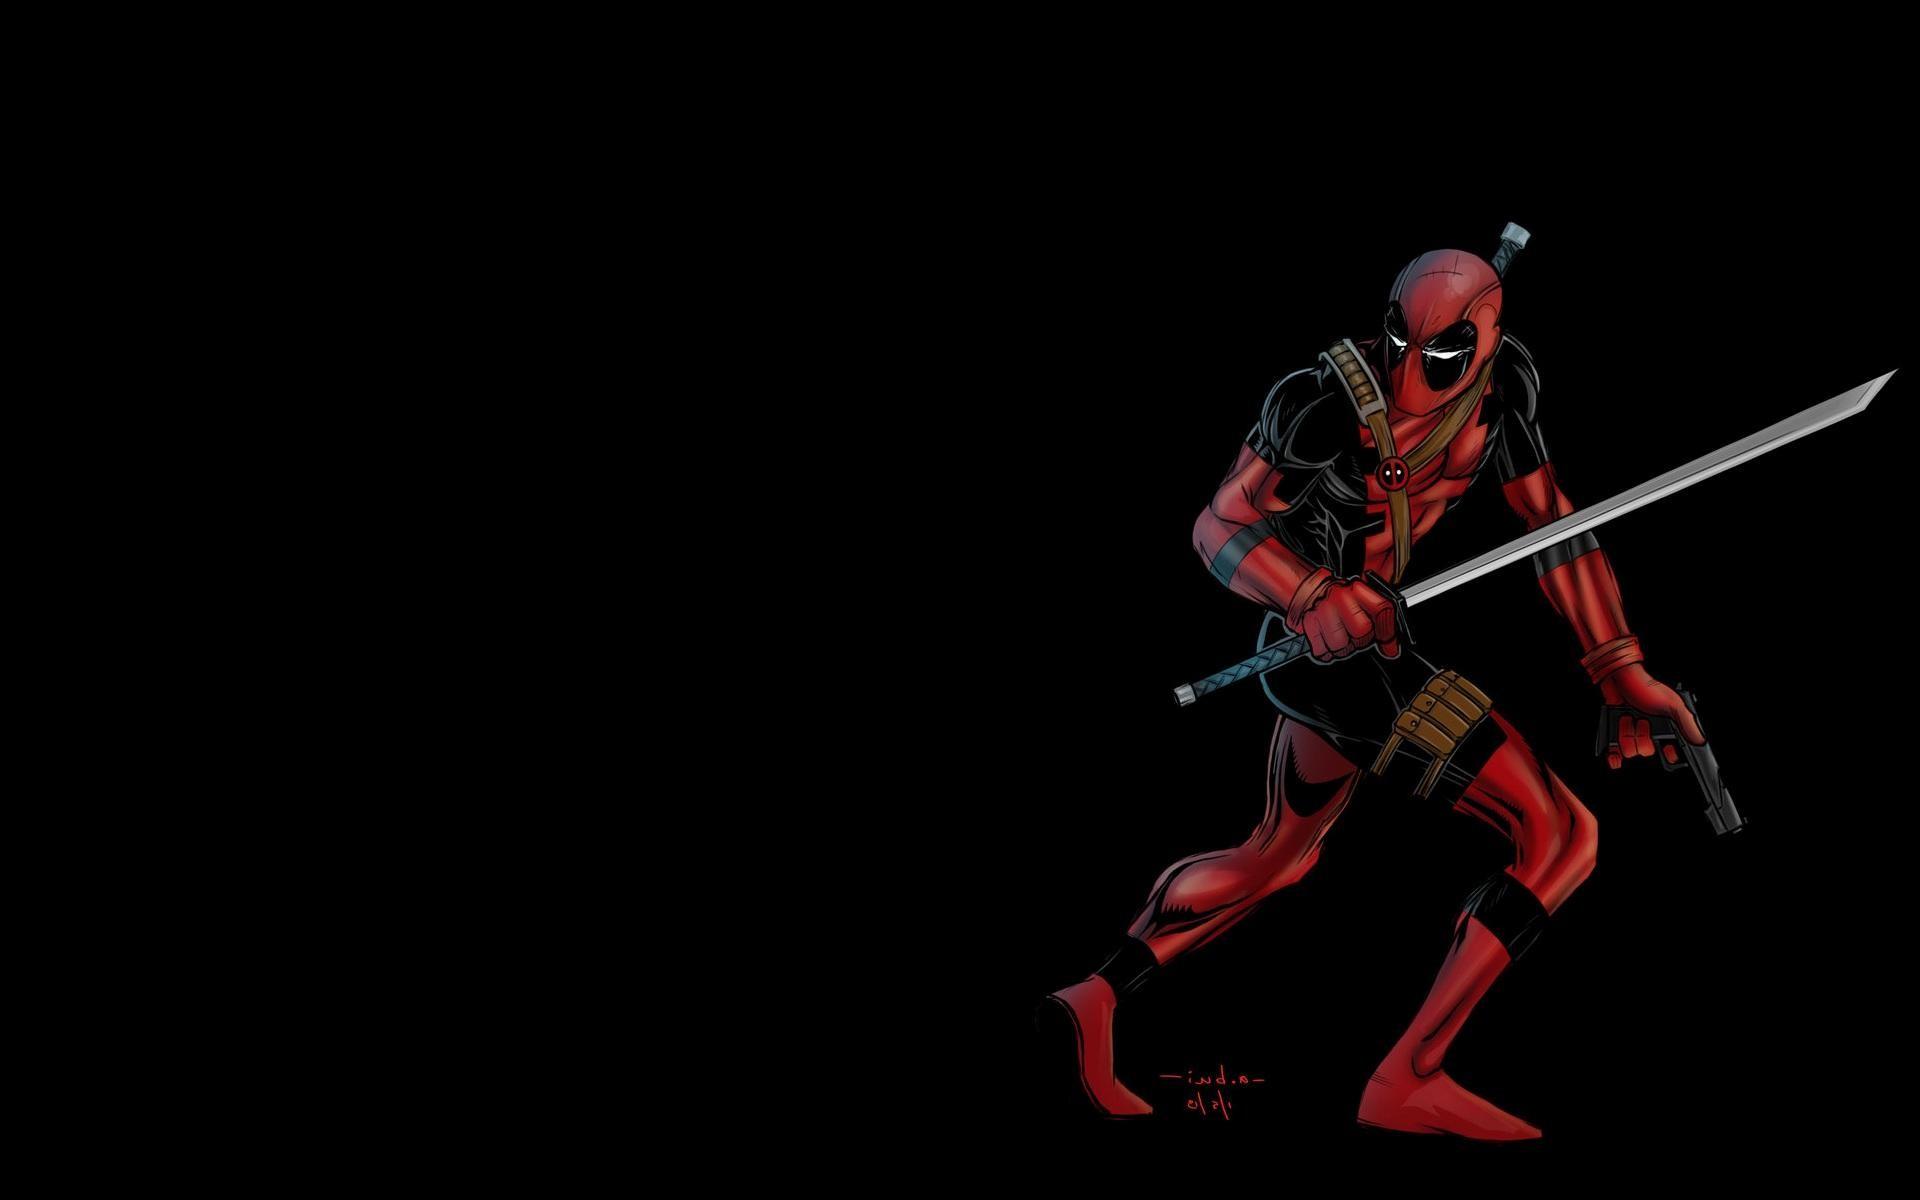 wallpaper.wiki-Deadpool-Desktop-Background-Wallpaper-PIC-WPB0010382